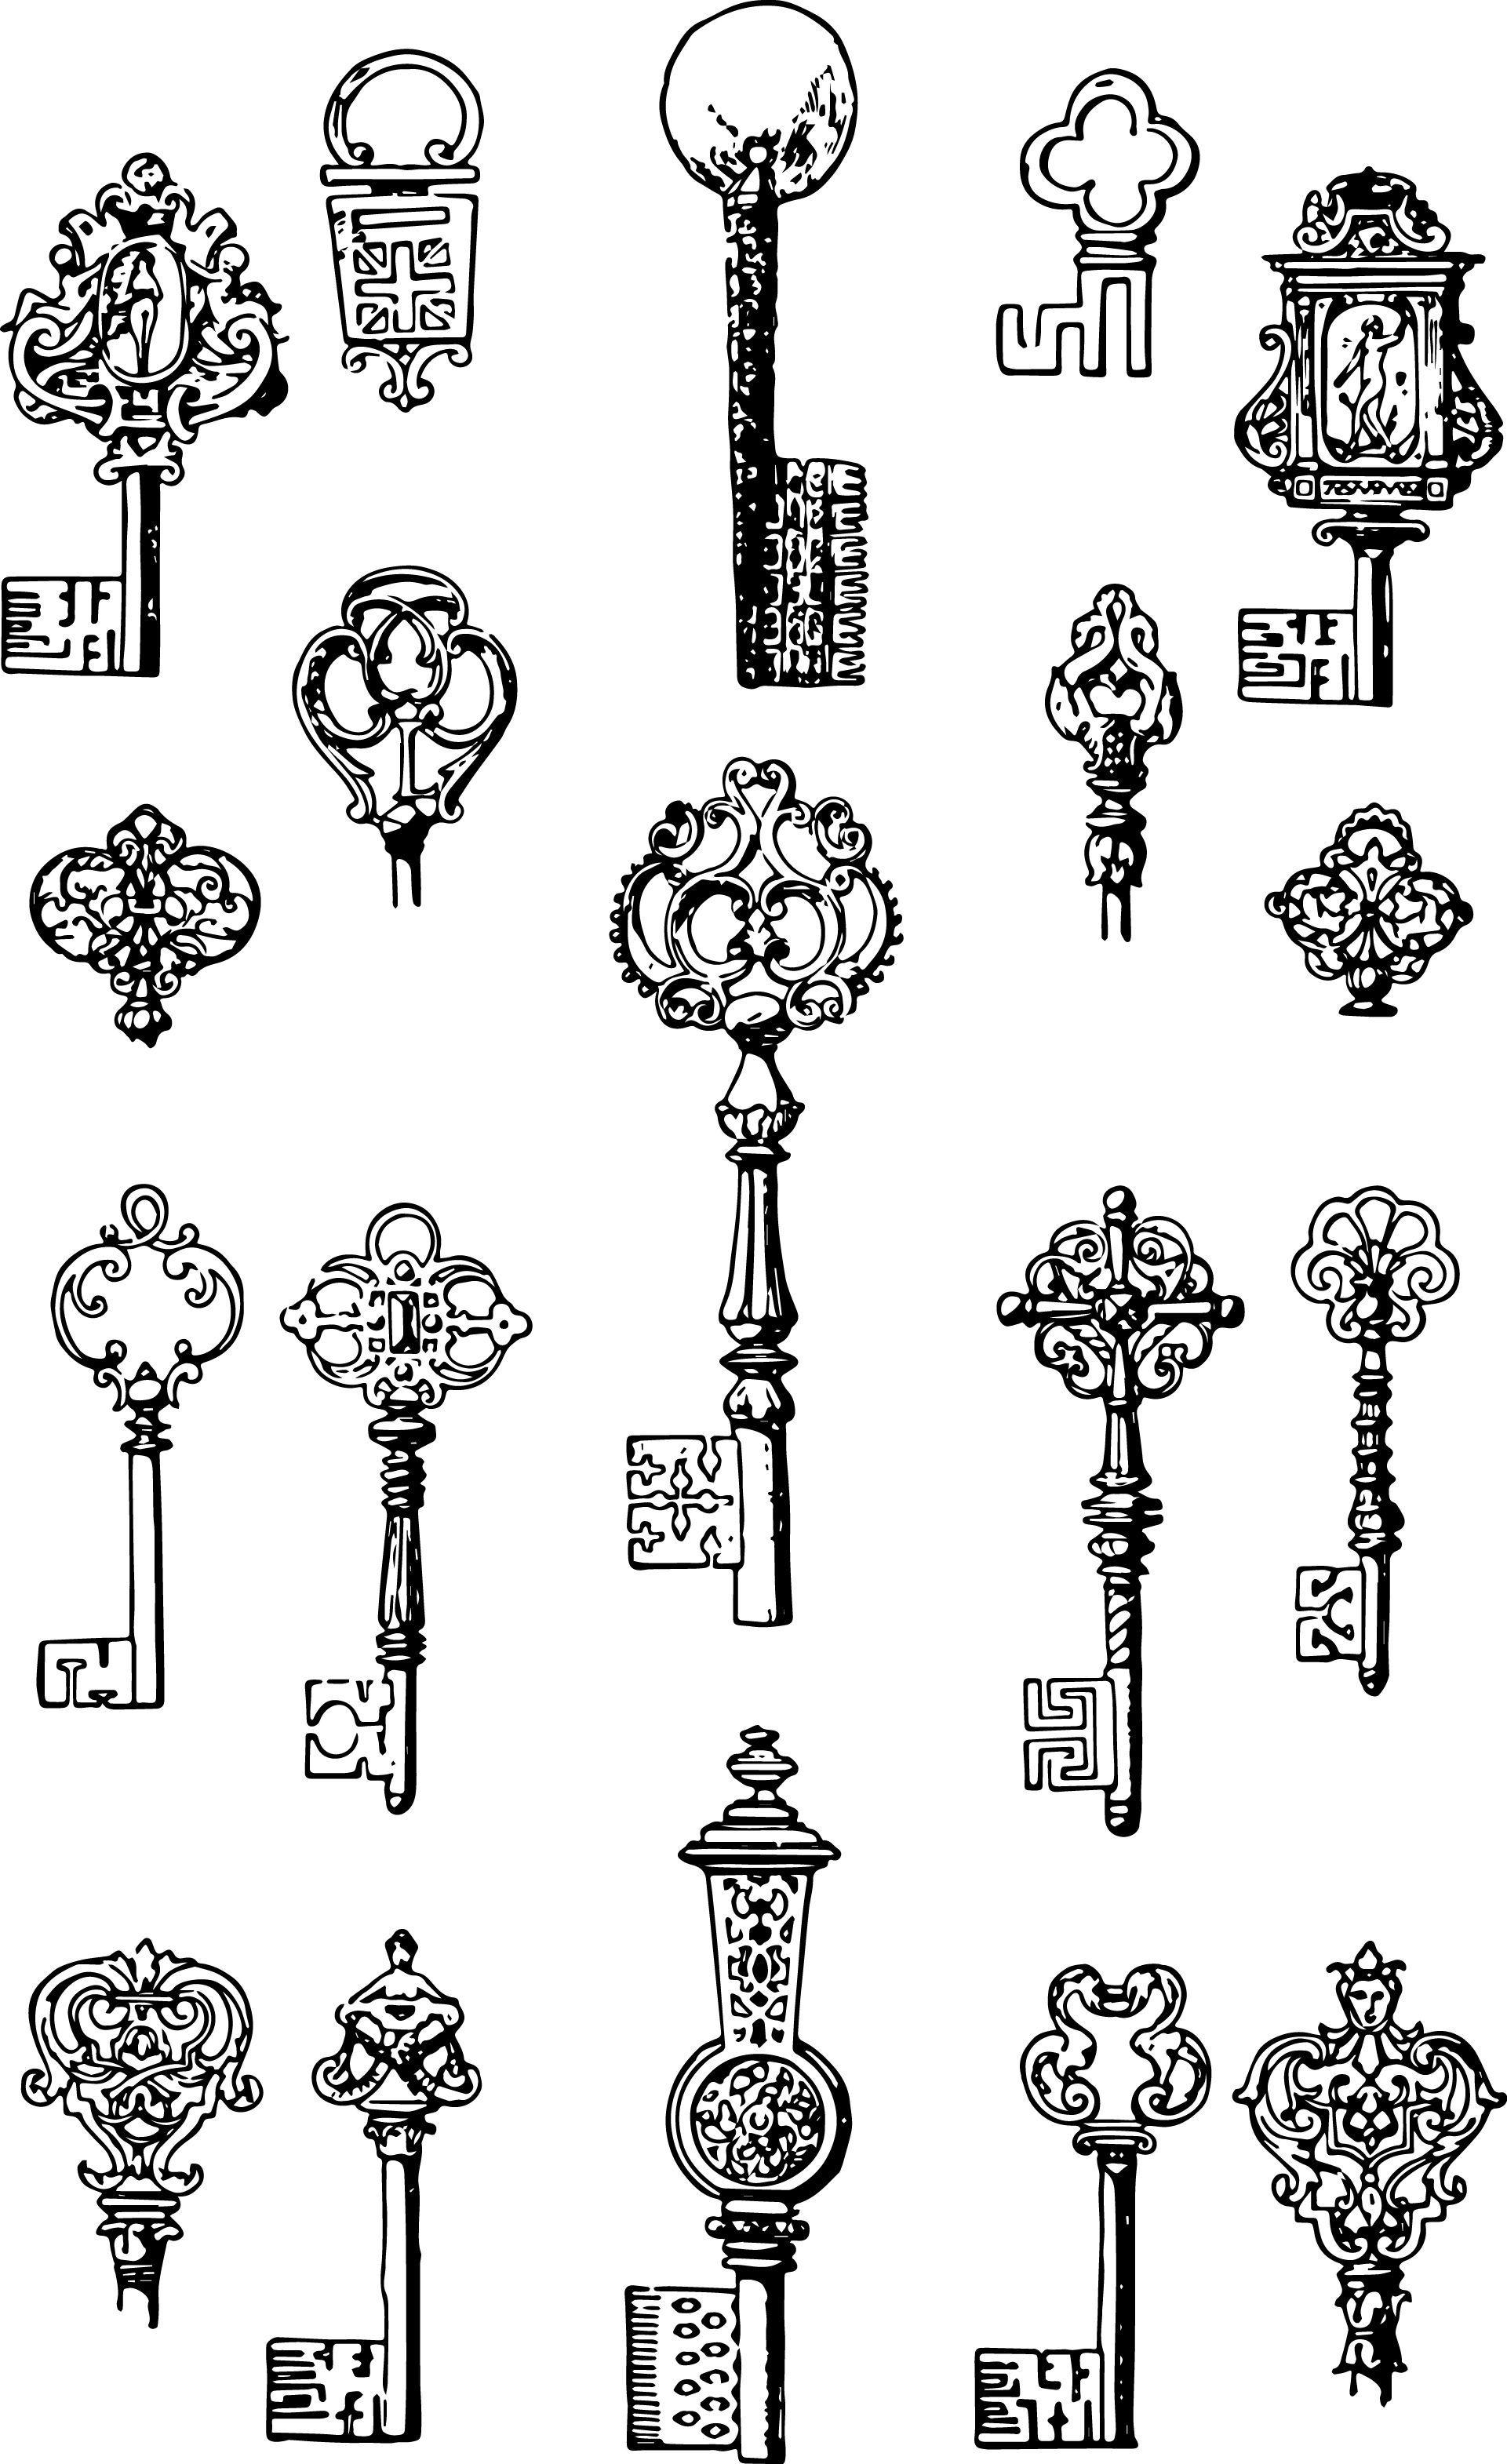 steampunk clipart ornate key #834 in 2019.